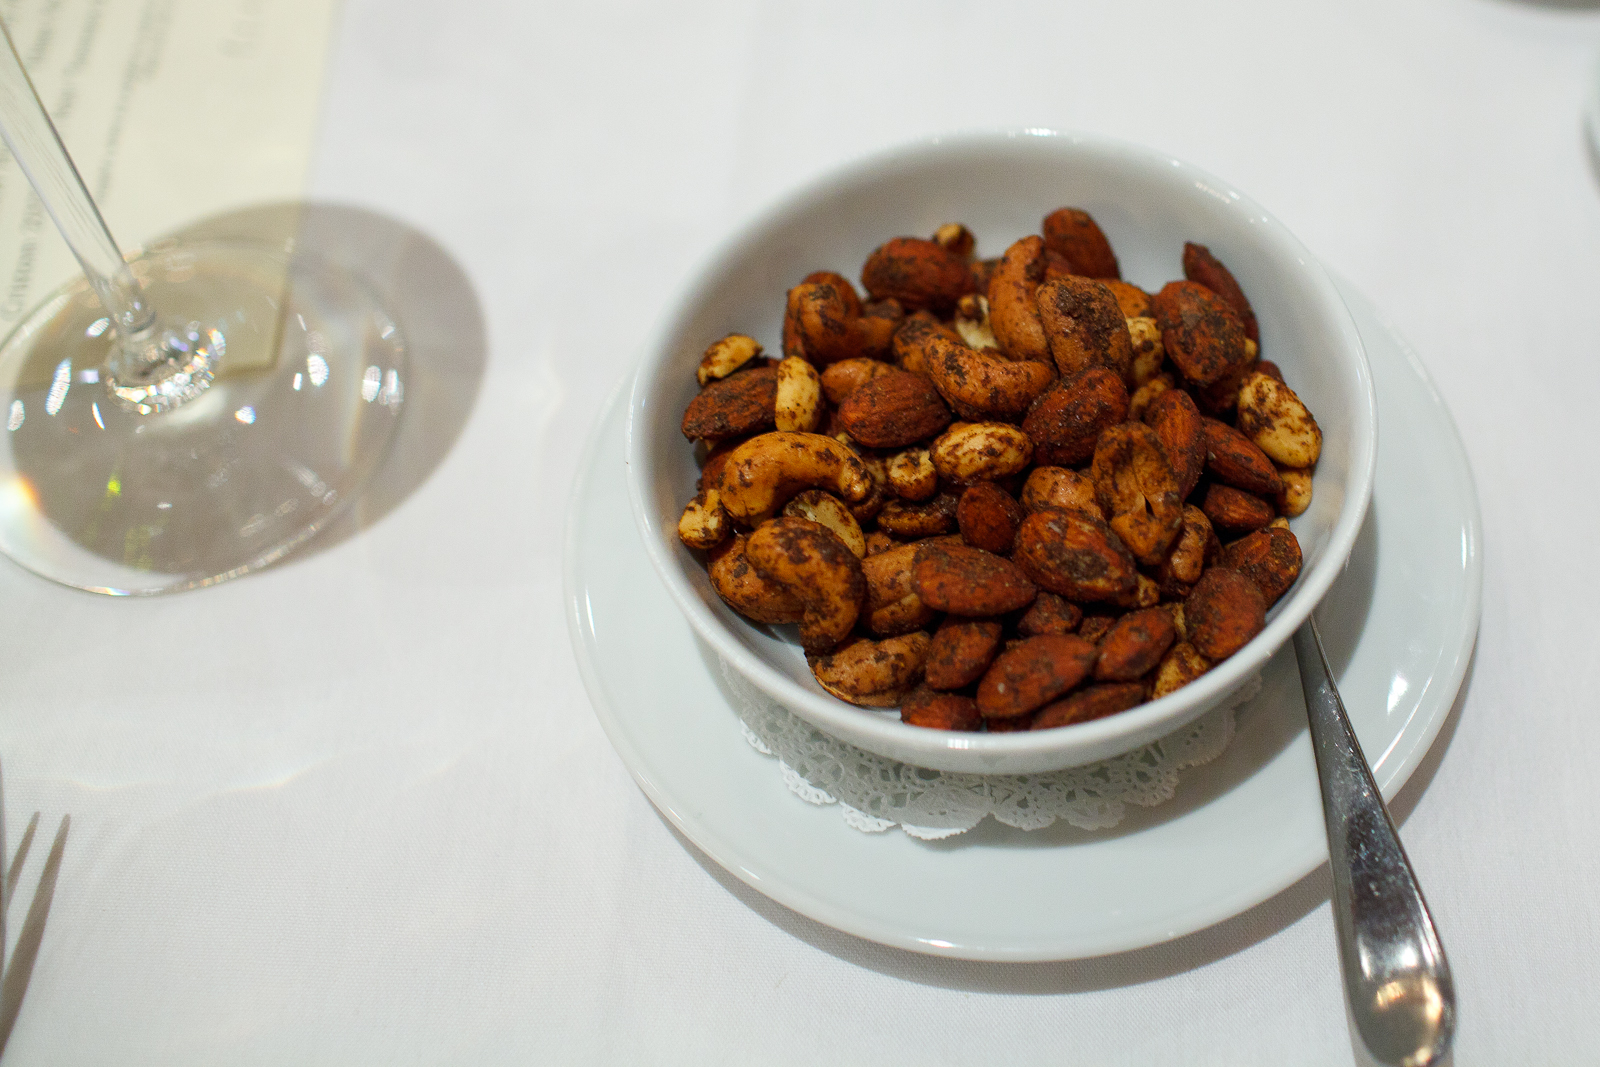 Snacks: Spiced Almond, Peanut, and Cashew